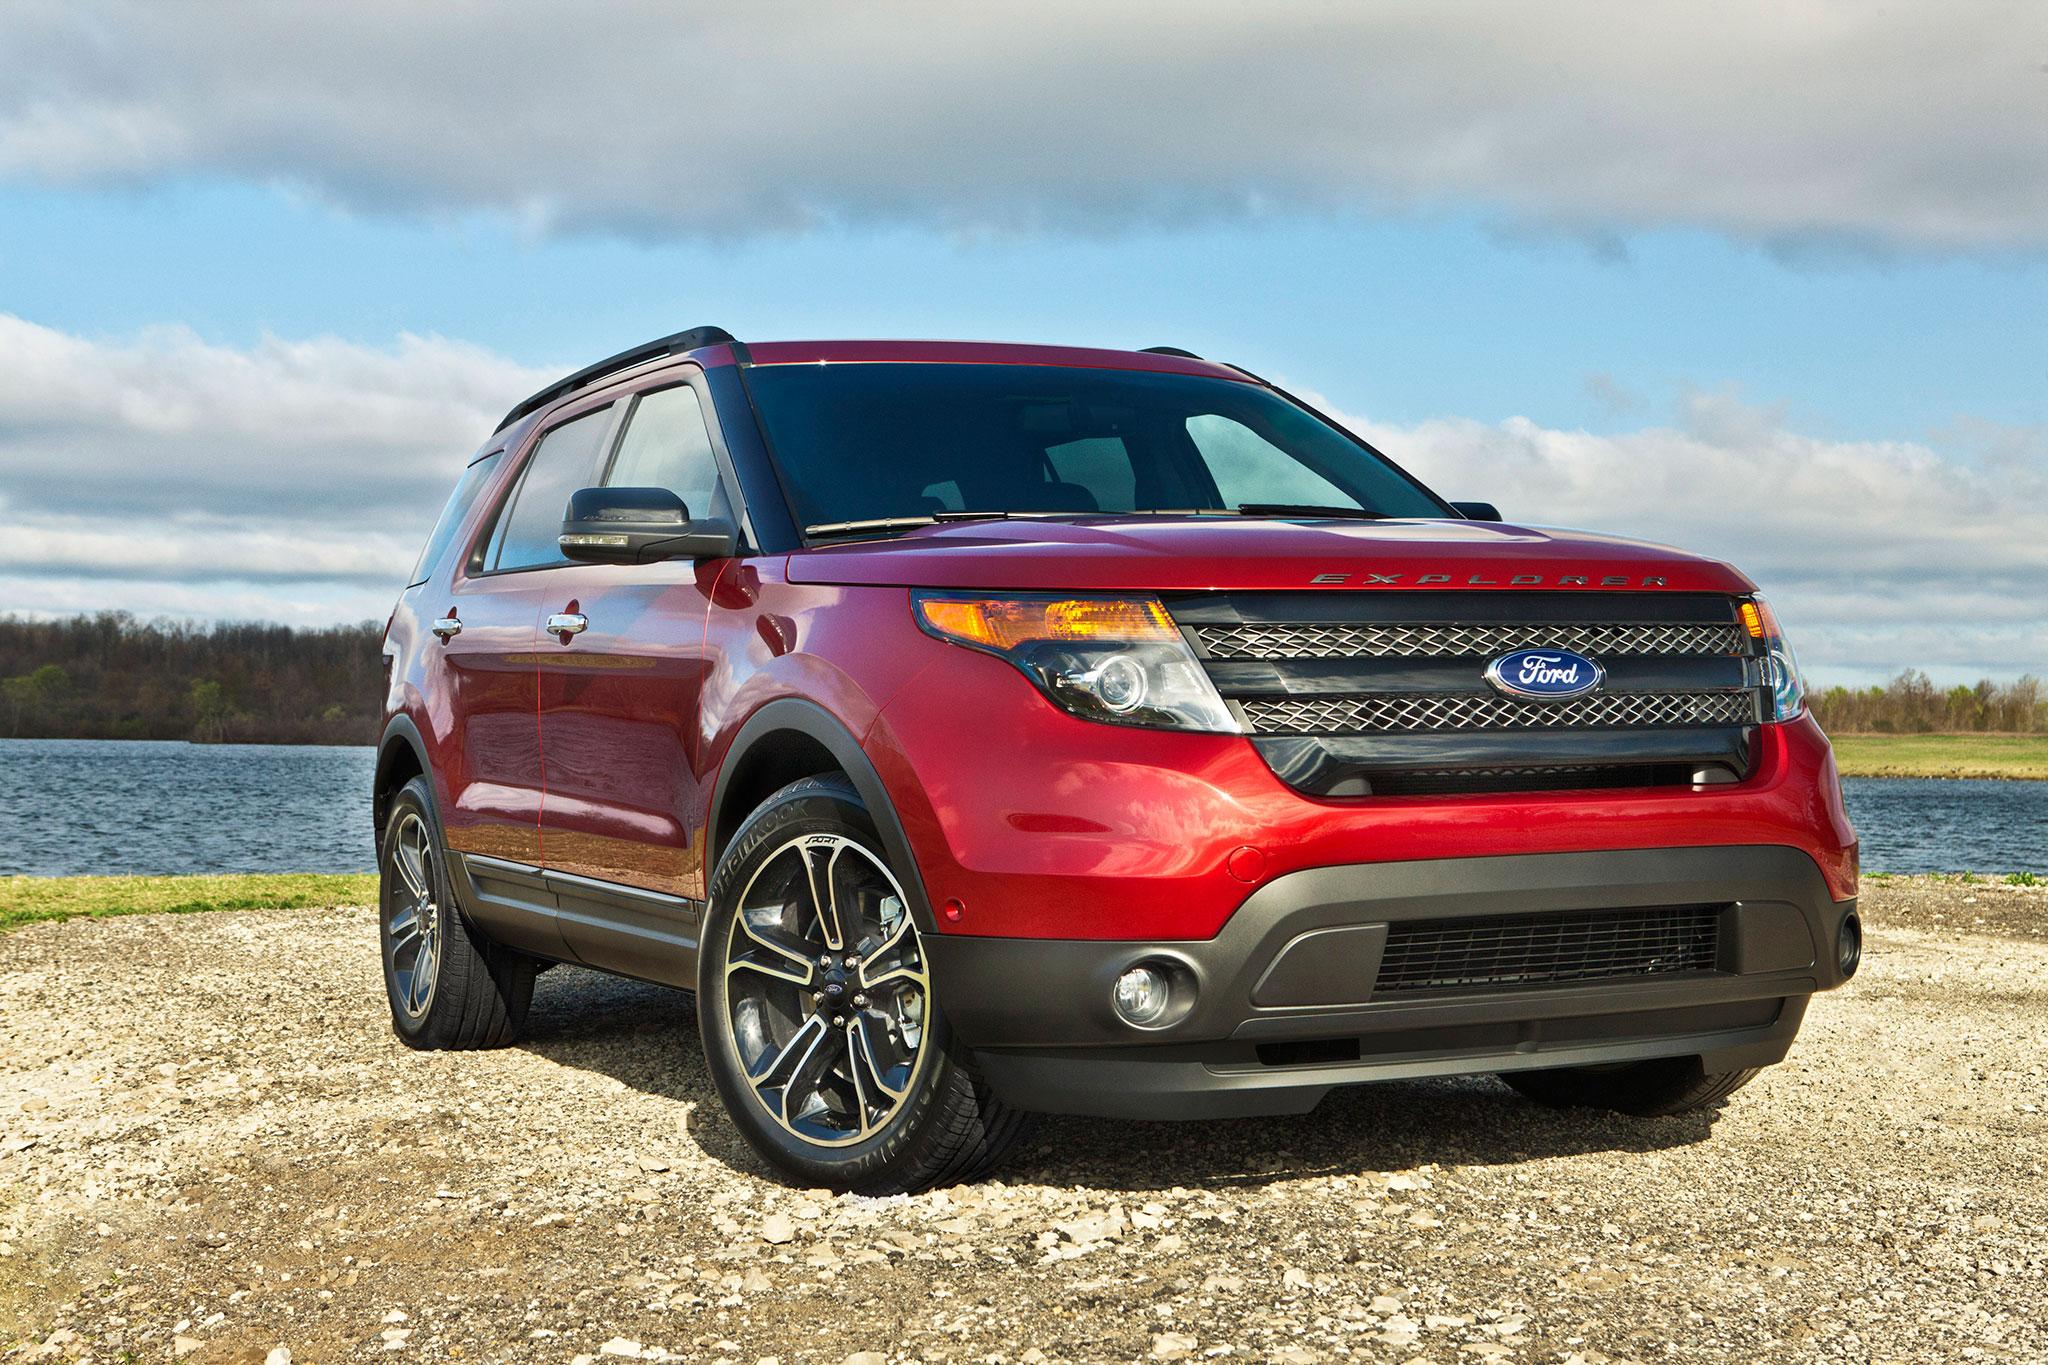 2015 ford explorer gets sporty appearance package automobile. Black Bedroom Furniture Sets. Home Design Ideas